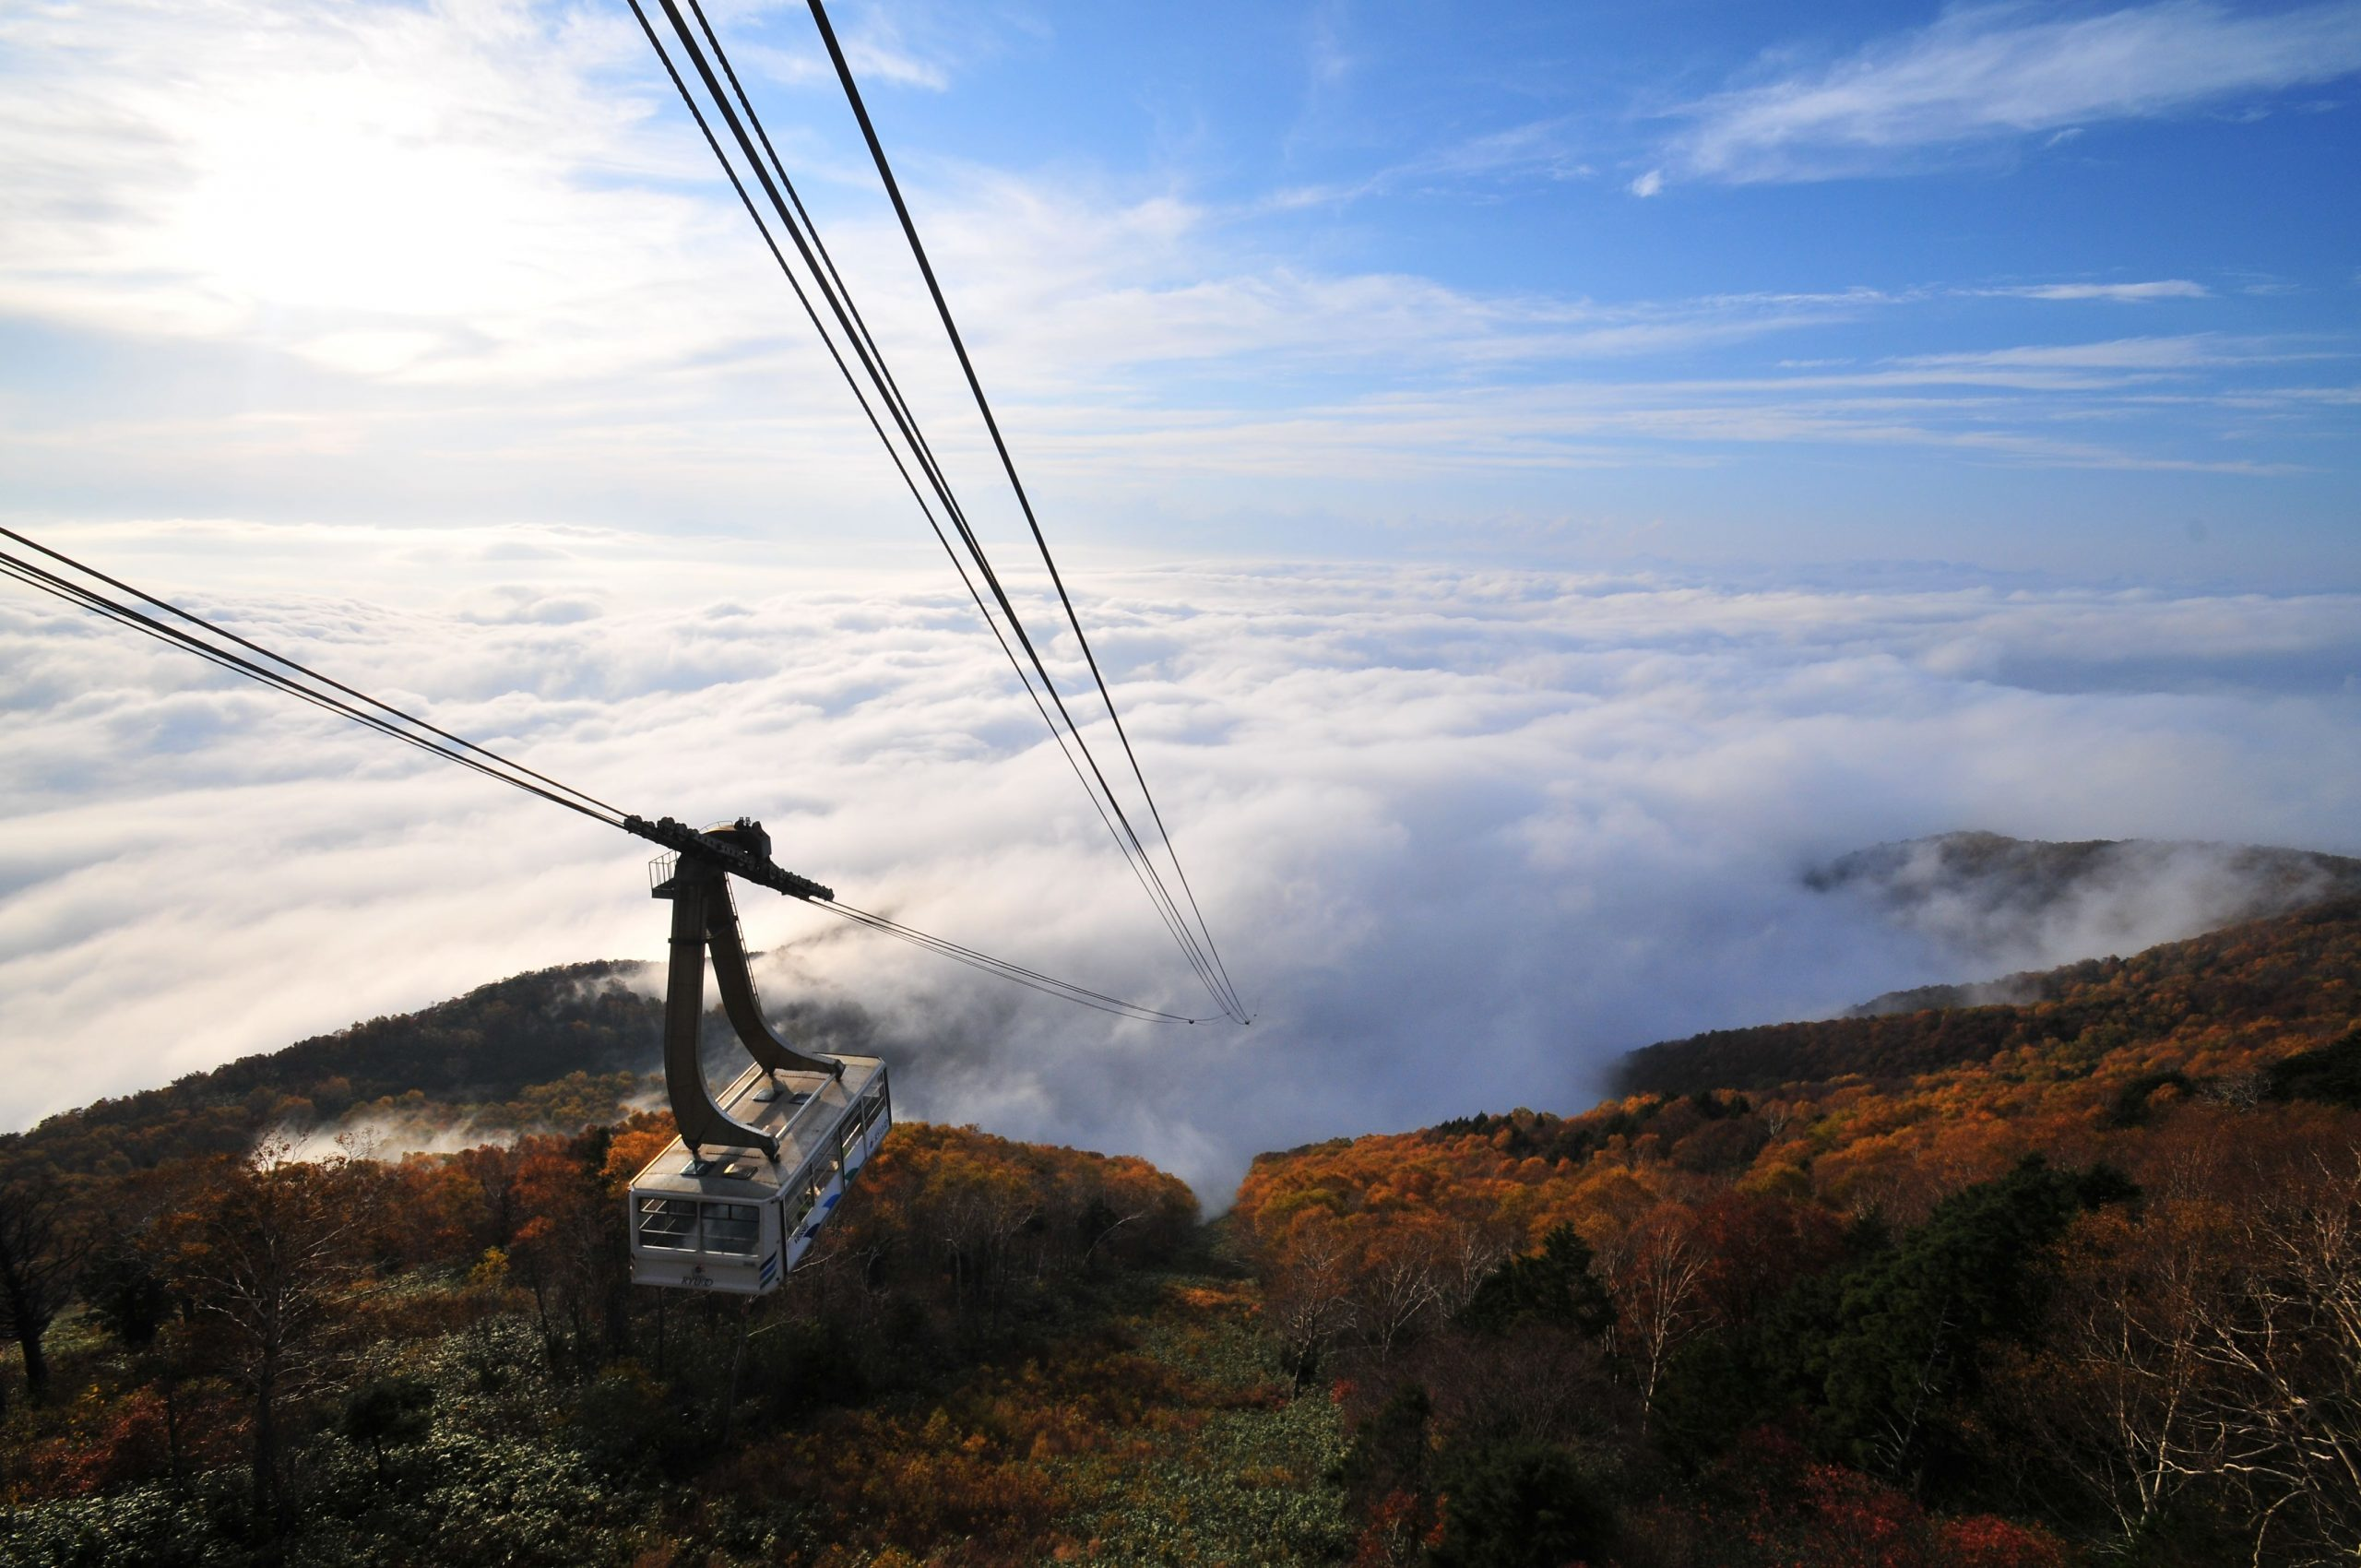 kitashiga-kogen-autumn-leaves-sora-terrace-ryuo